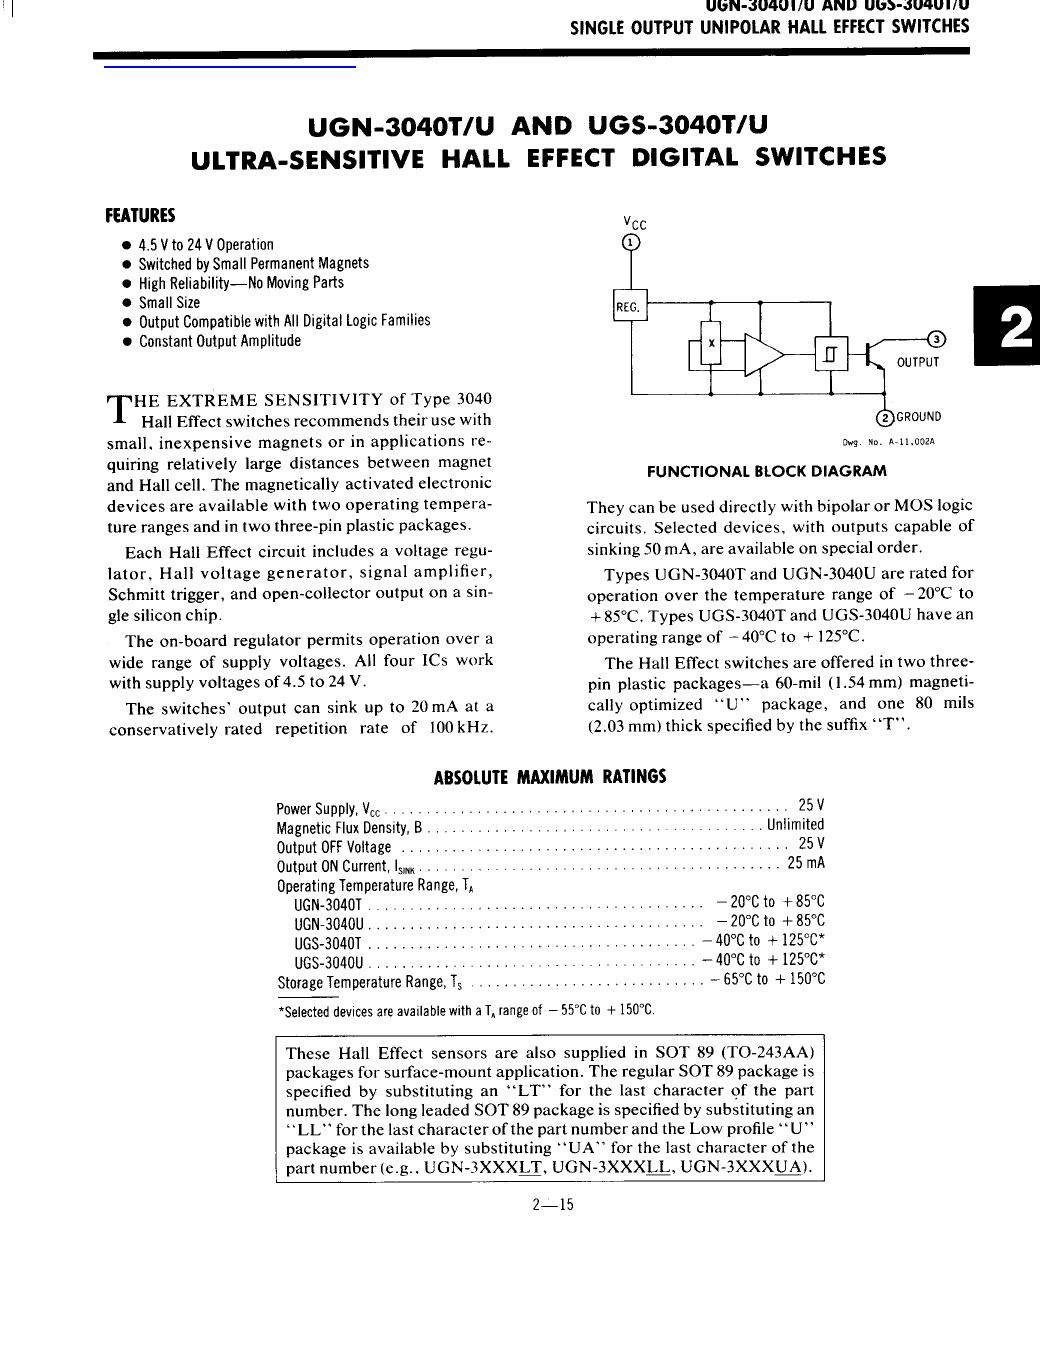 UGS-3040U دیتاشیت PDF